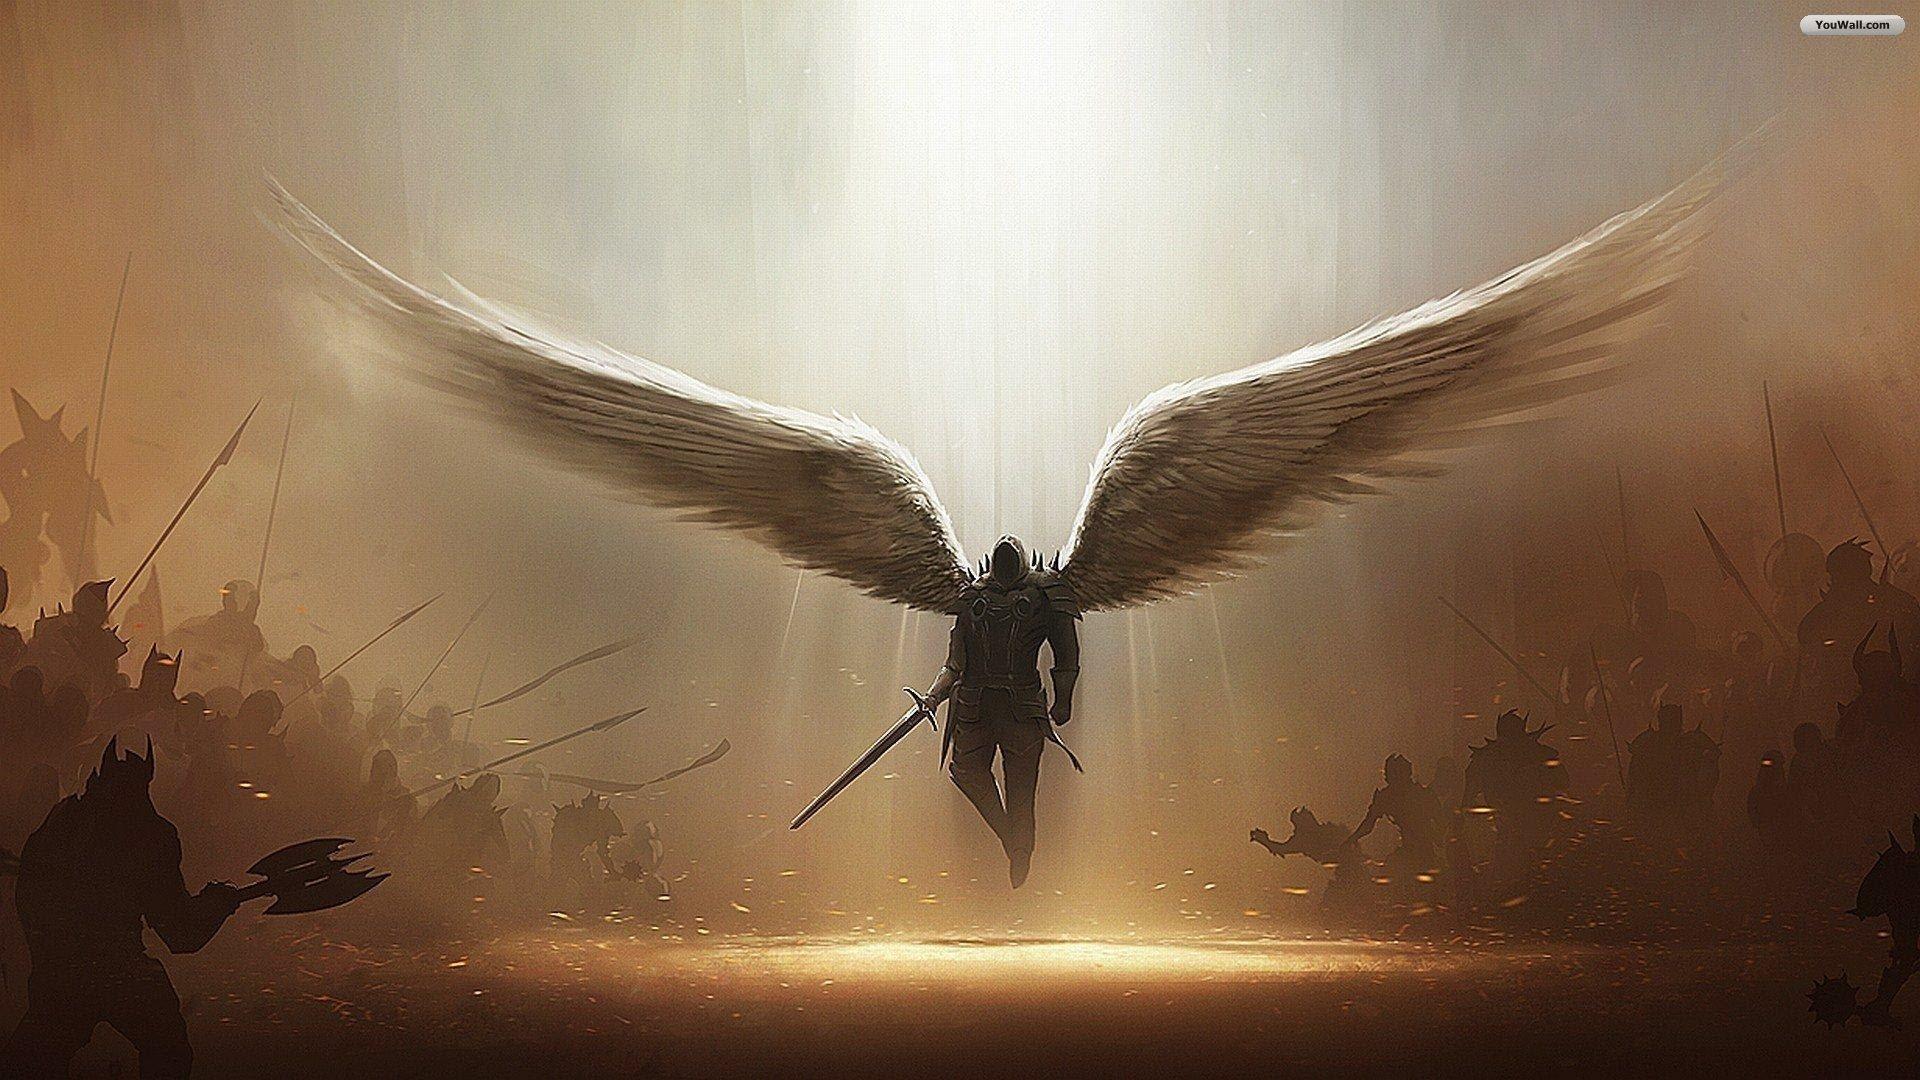 YouWall   Angel of War Wallpaper   wallpaperwallpapersfree wallpaper 1920x1080